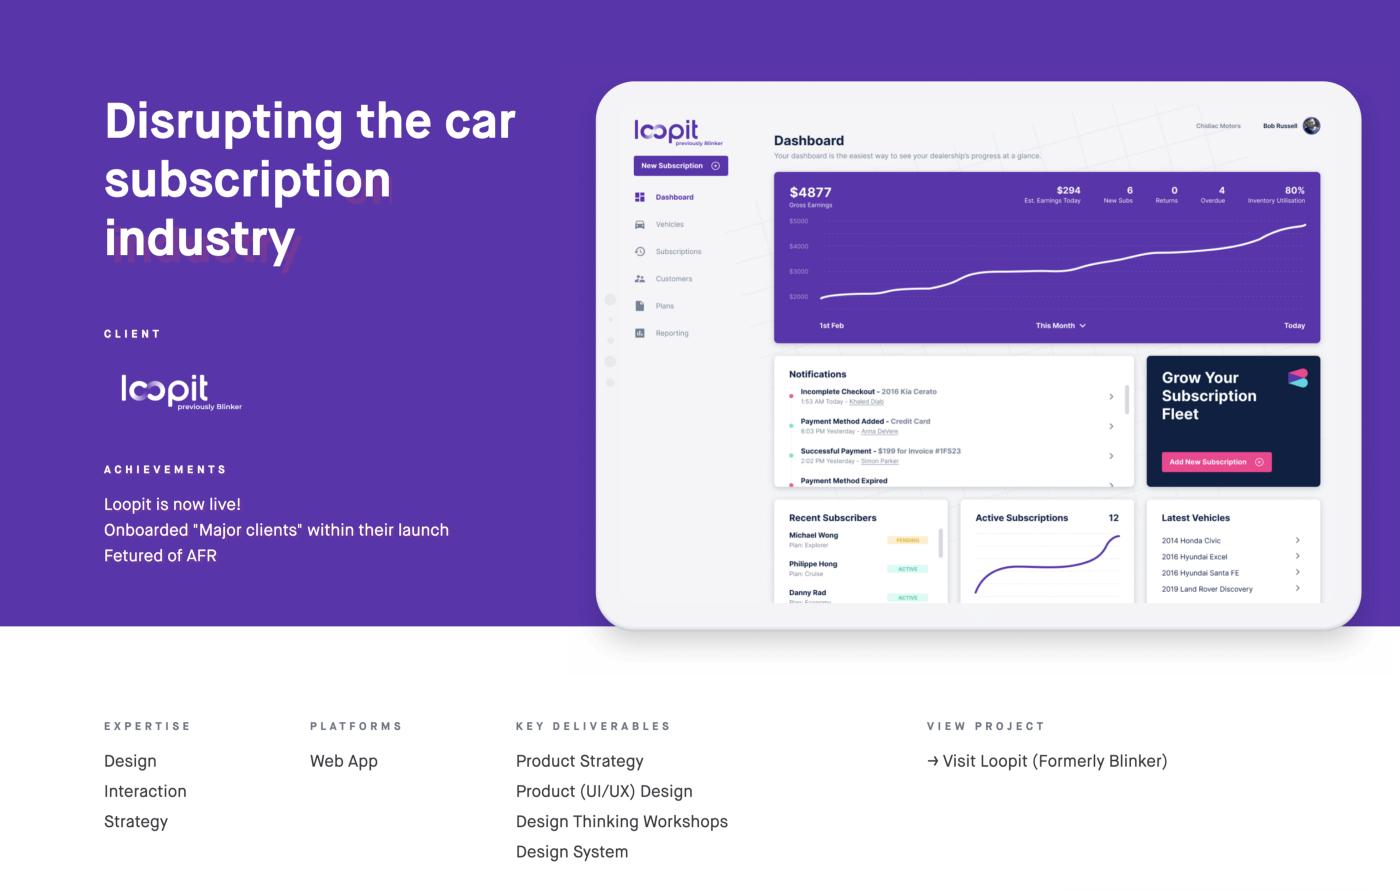 loopit case study header showing ipad dashboard design